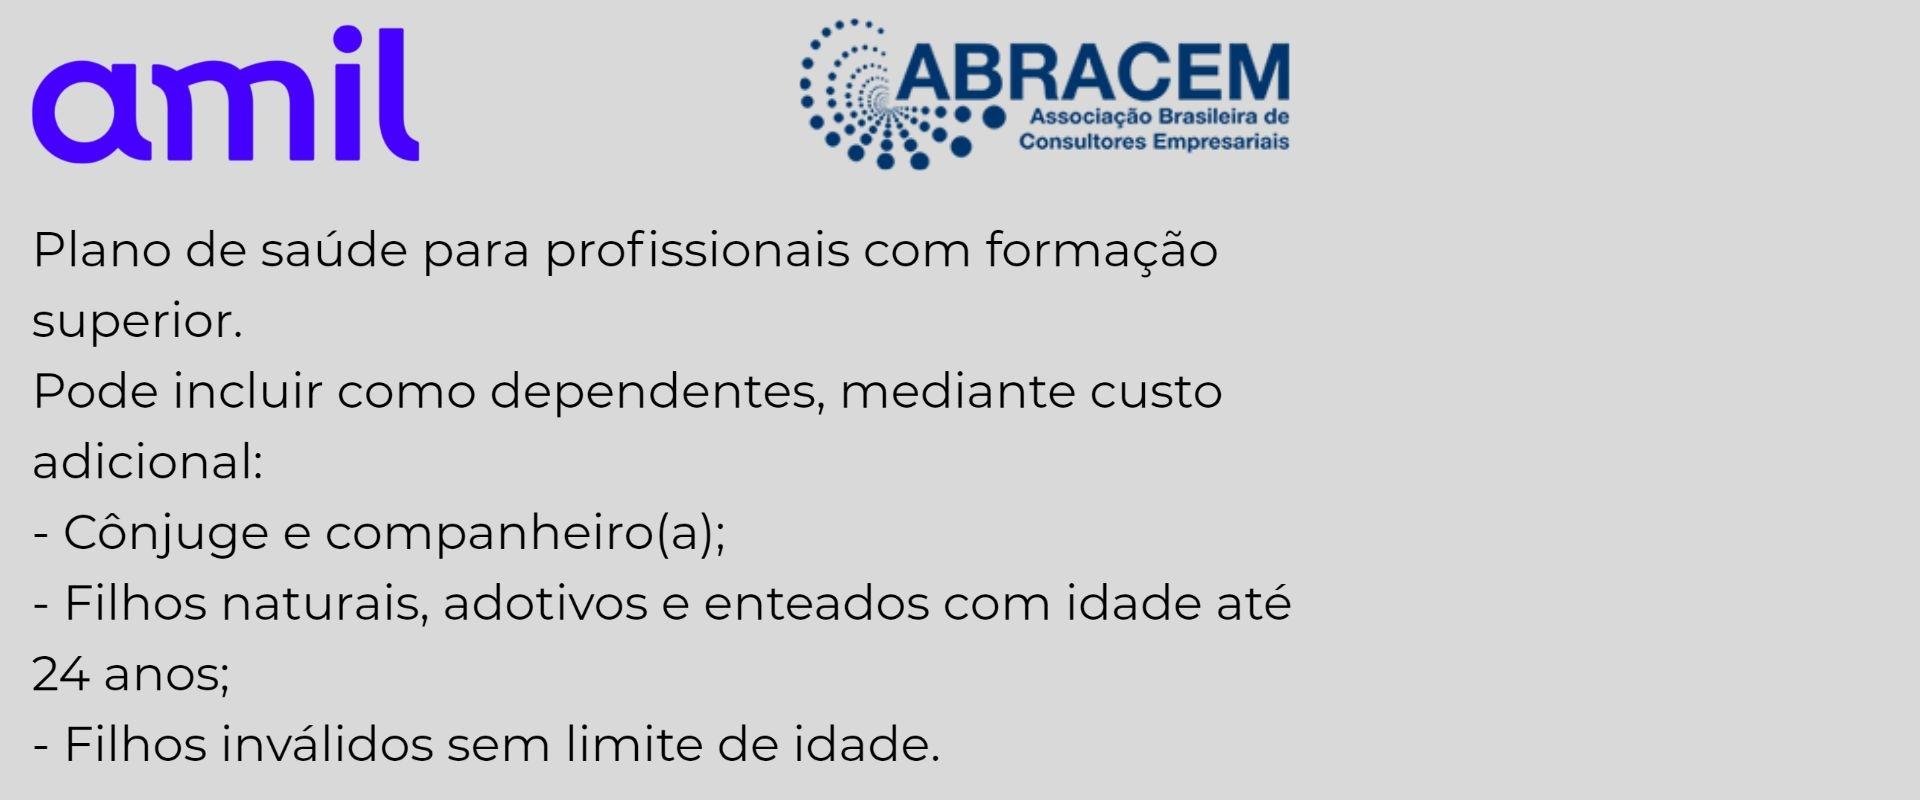 Amil Abracem-BA